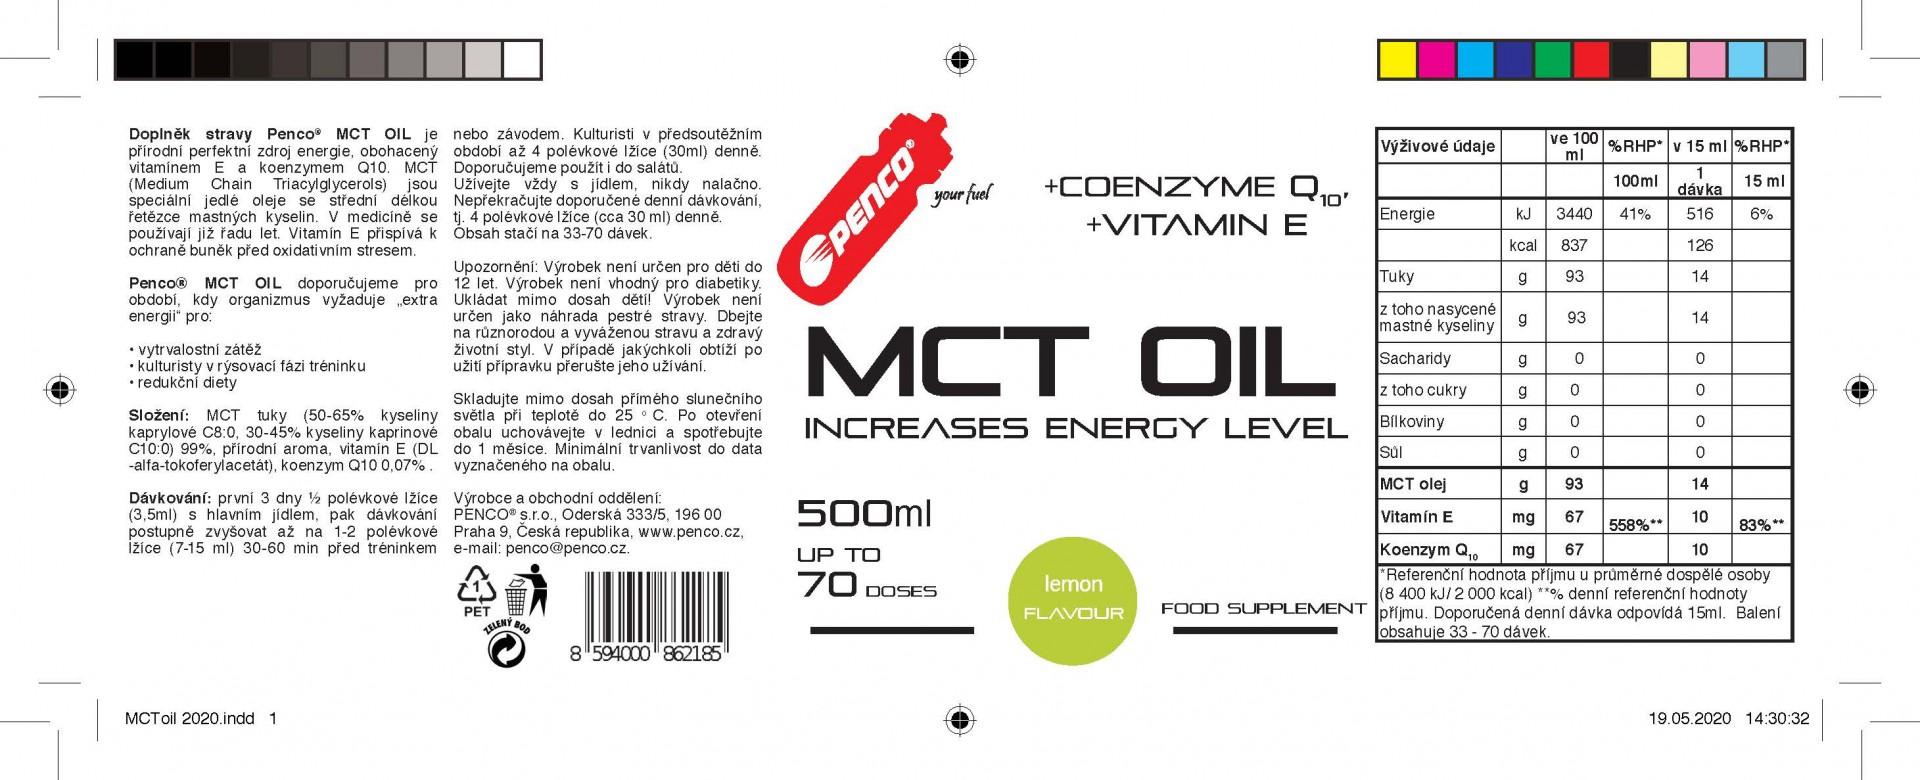 Rychlý zdroj energie  MCT OIL 500ml  Citron č.2